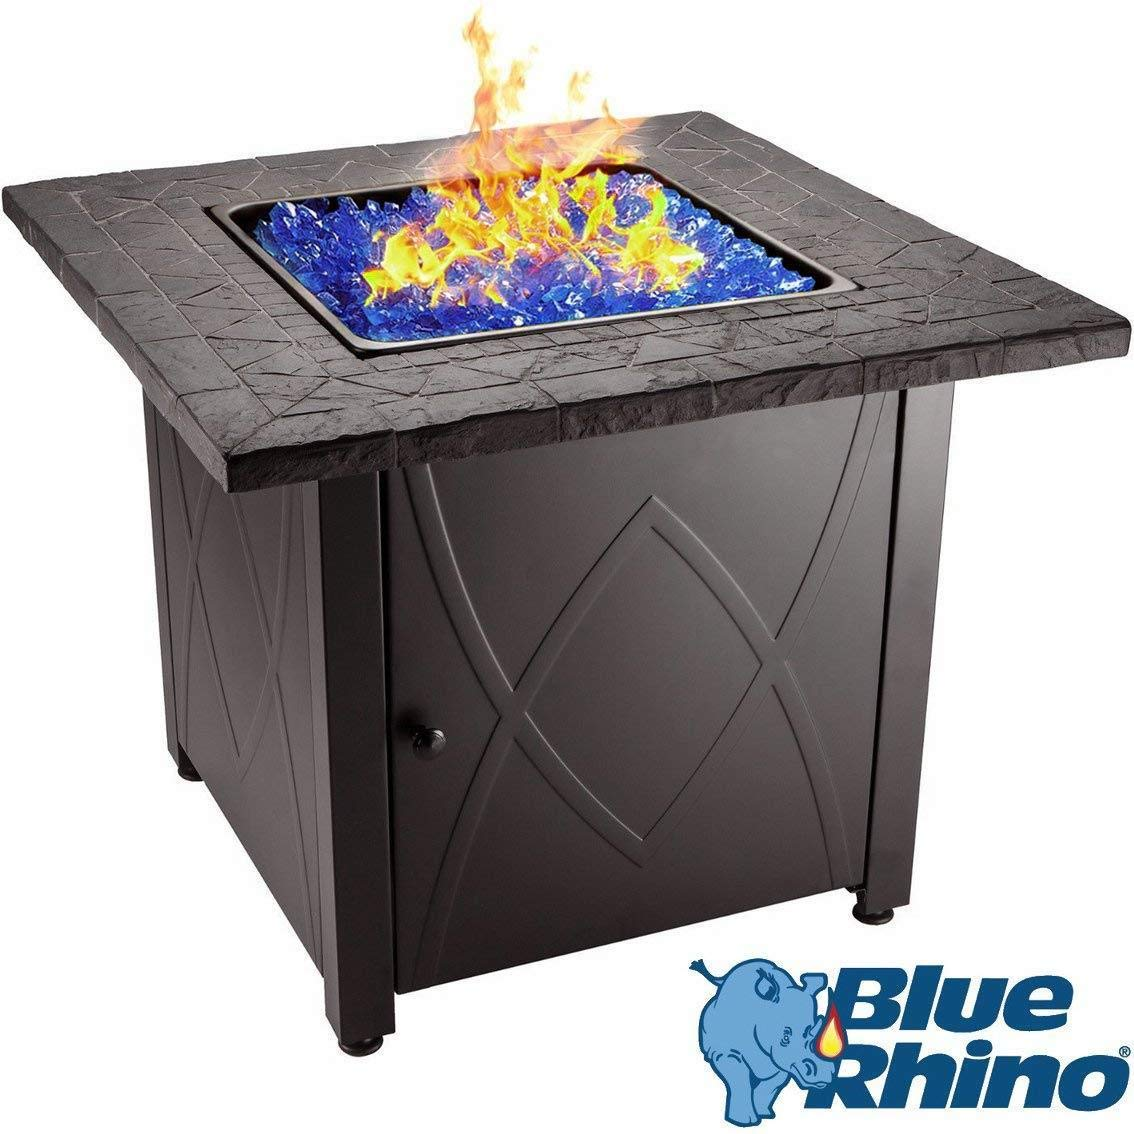 Blue Fireglass Blue Rhino Outdoor Propane Gas Fire Pit